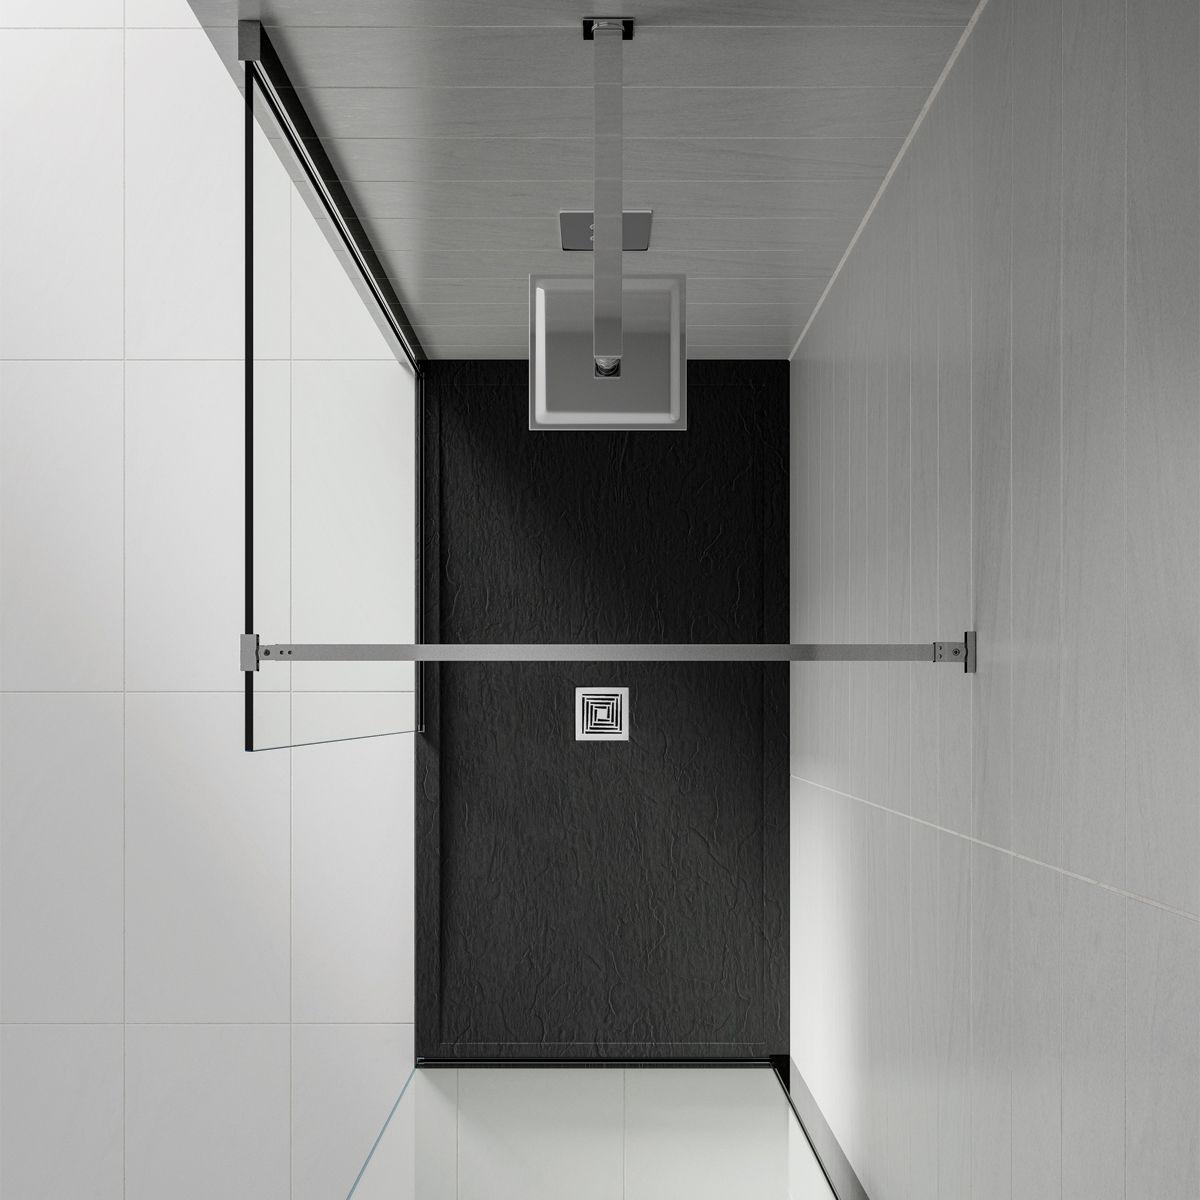 Aquadart Black Slate Shower Tray 1400 x 700 Overhead